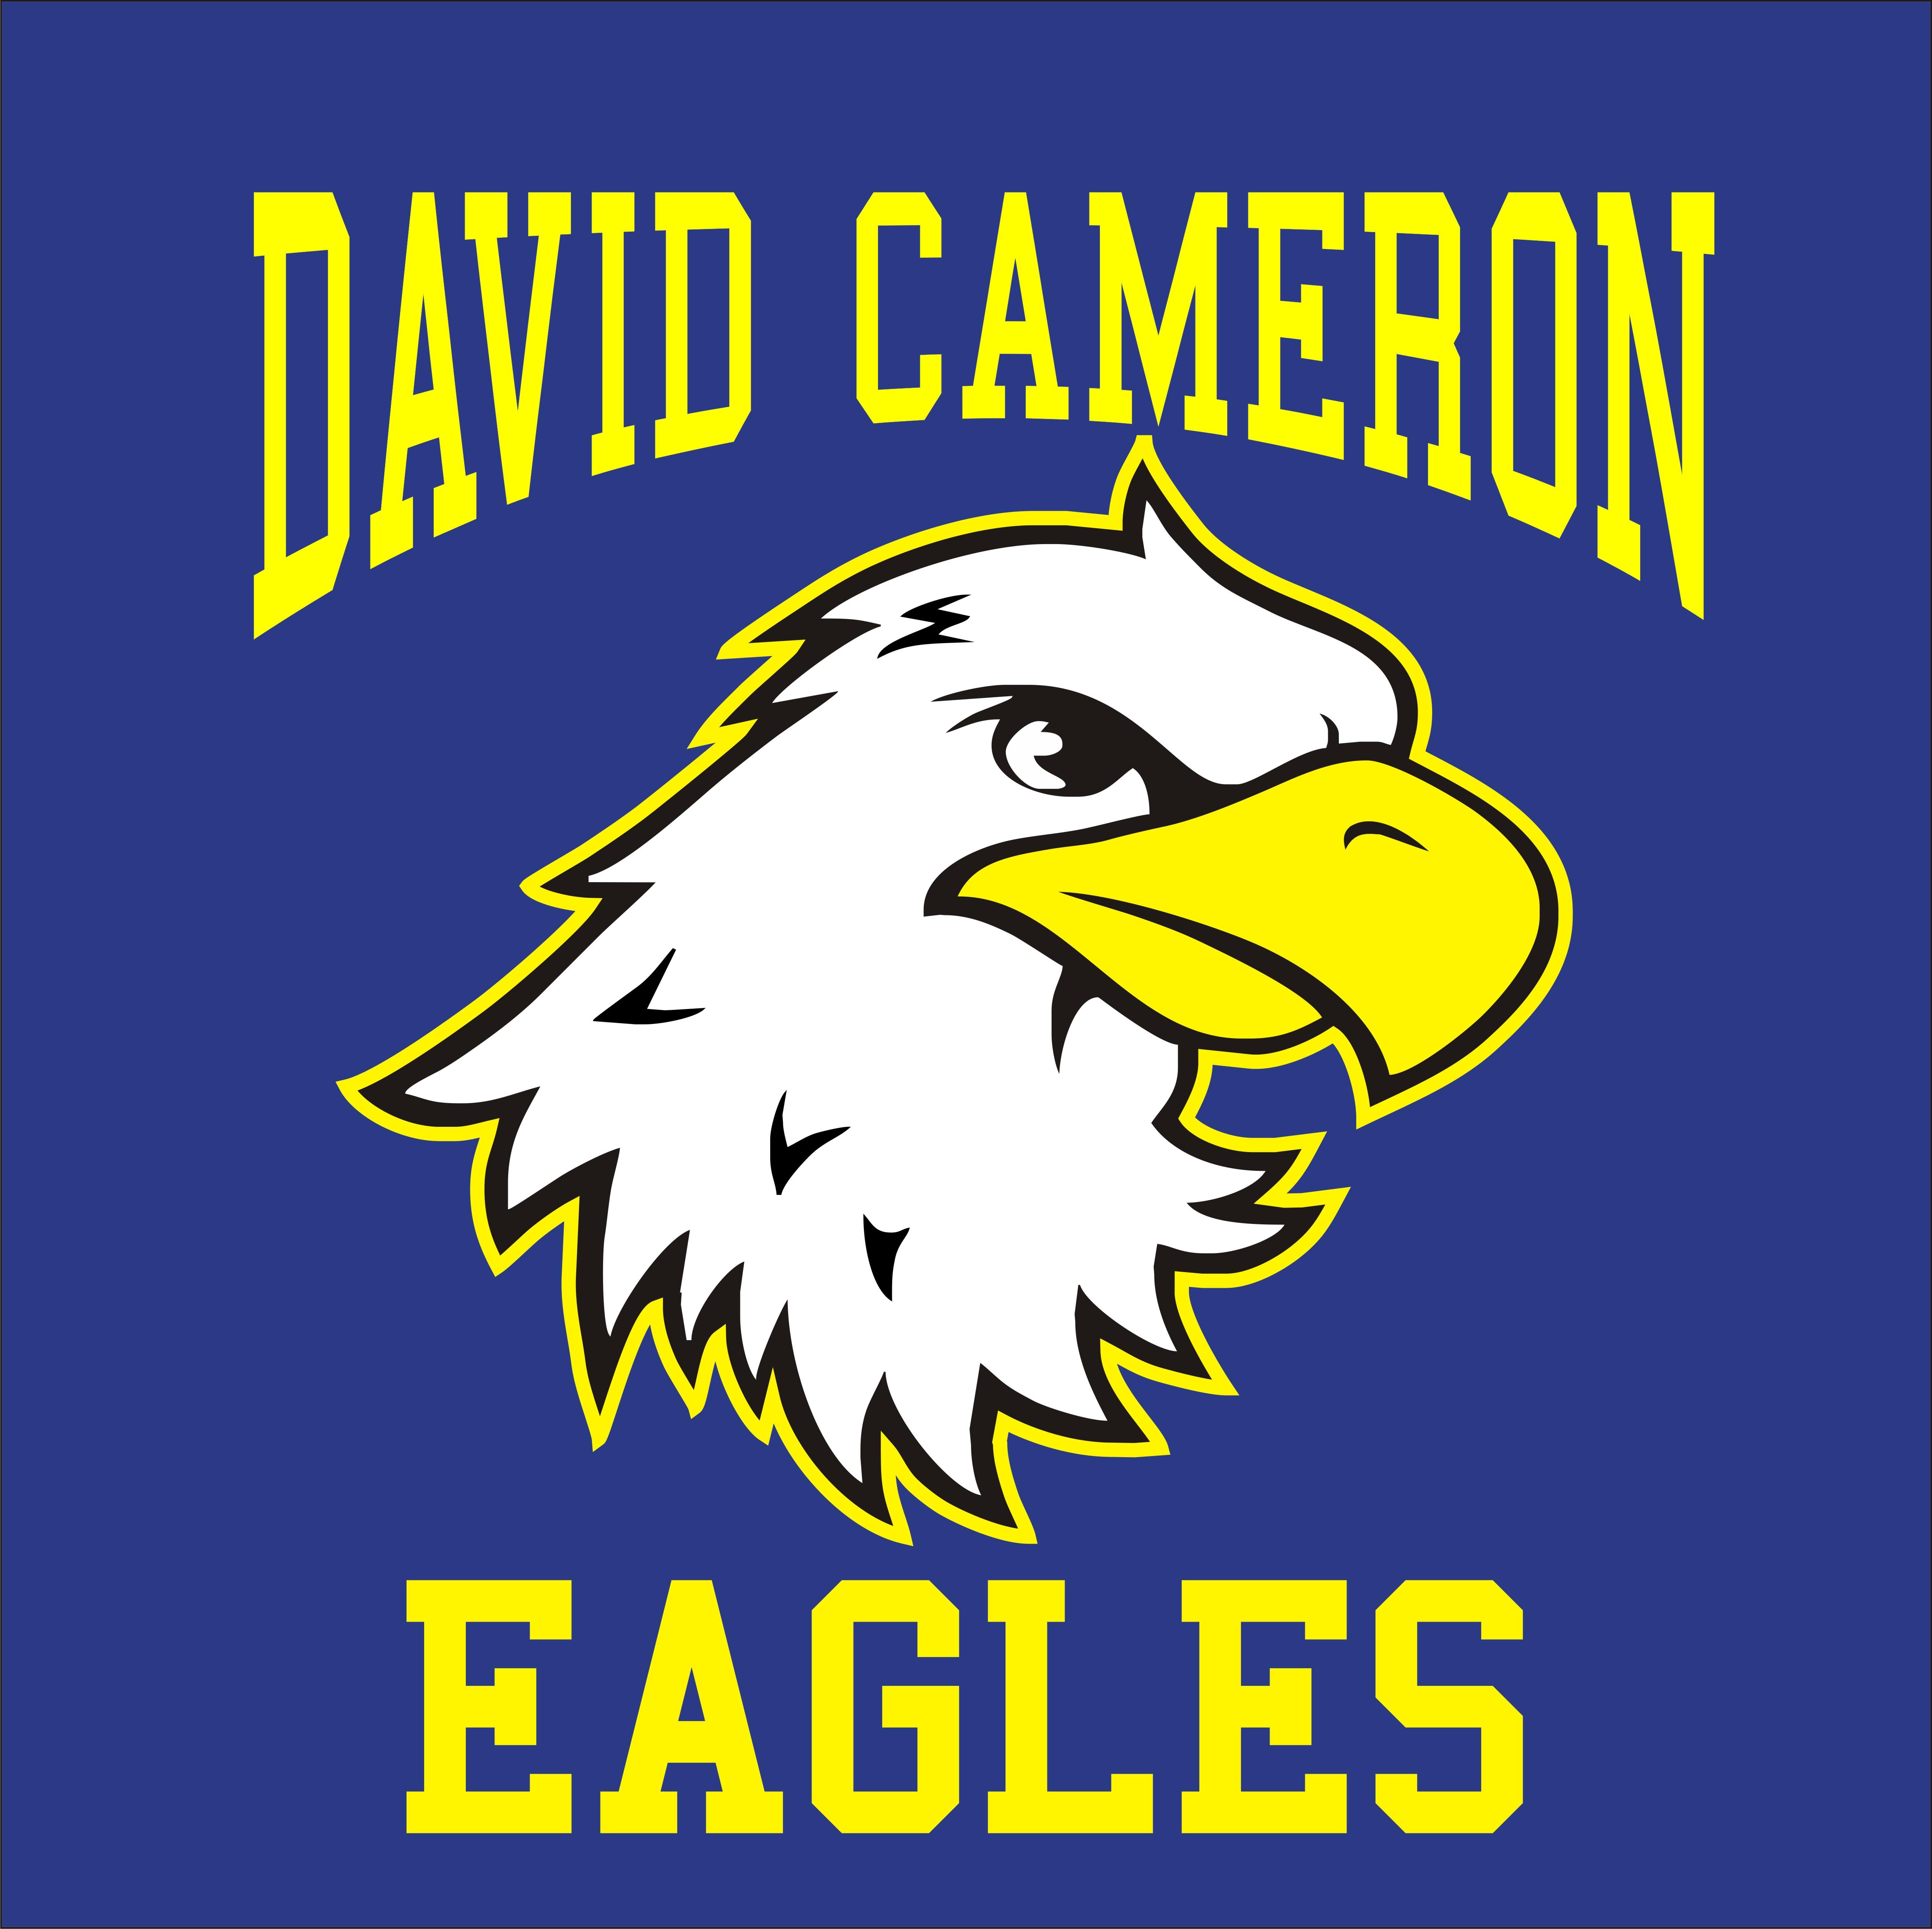 David Cameron Elementary